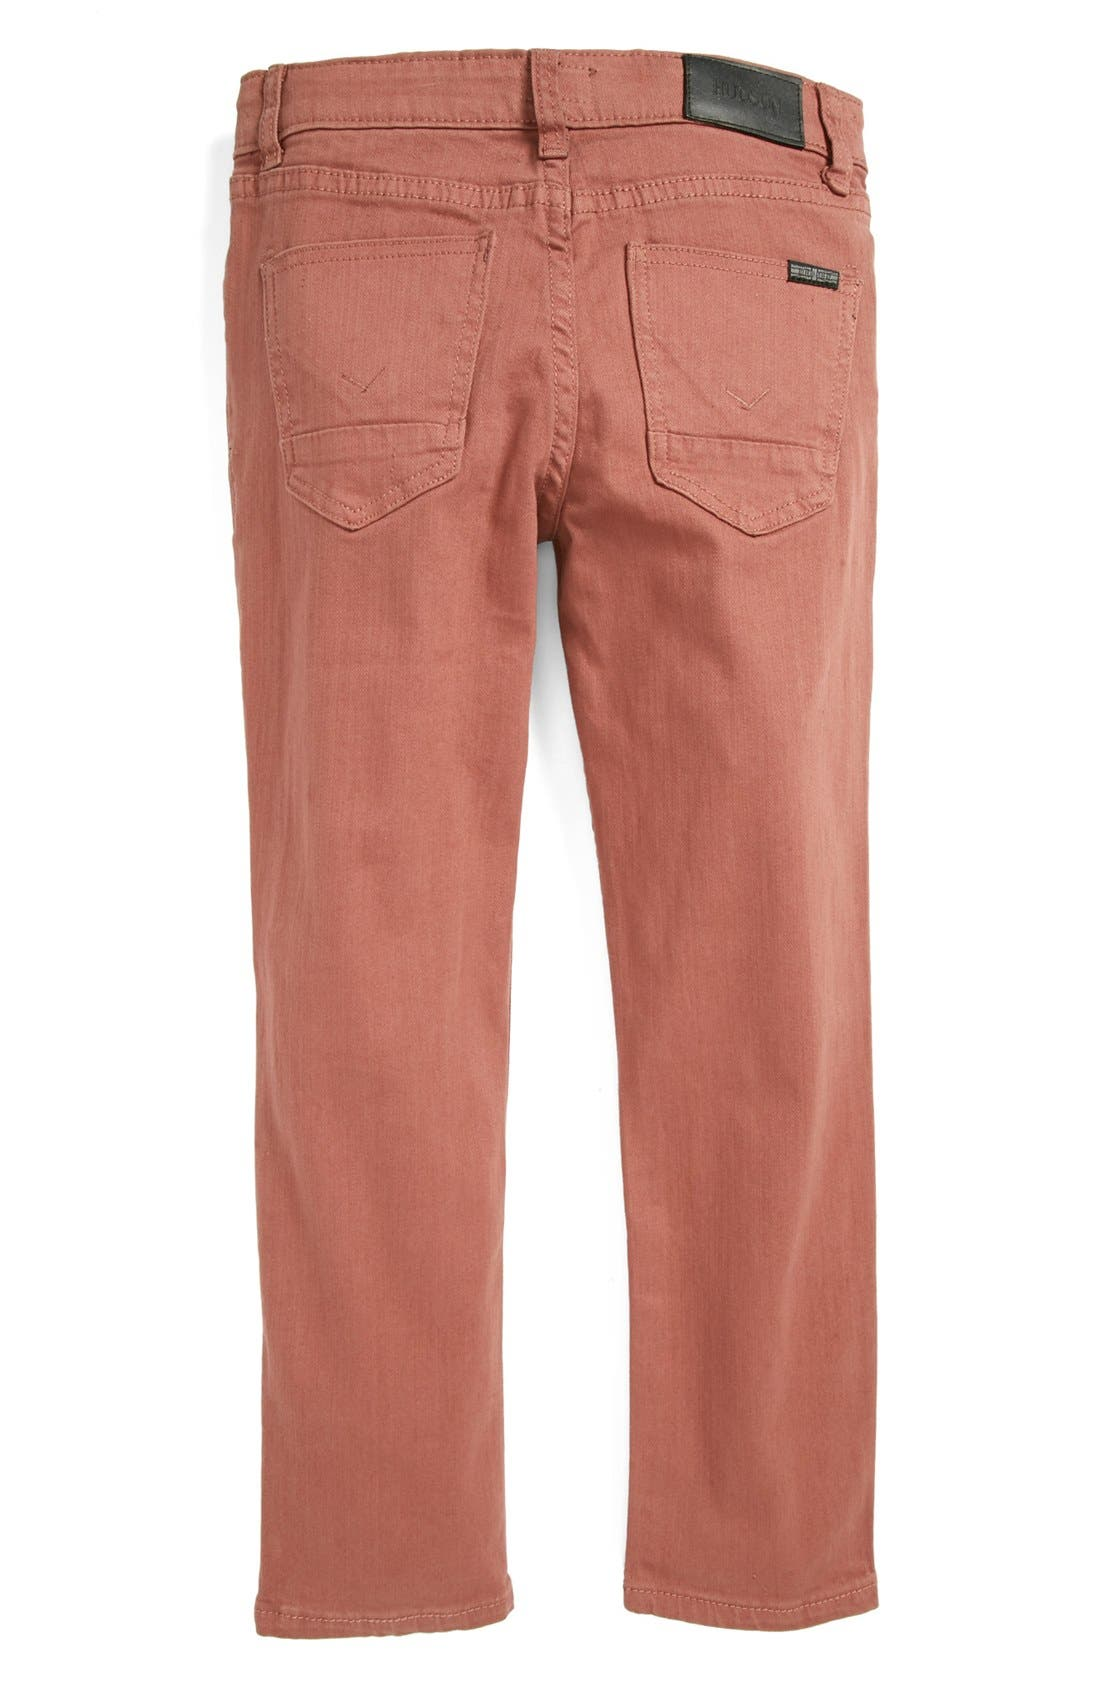 Alternate Image 1 Selected - Hudson Kids Jeans (Toddler Boys)